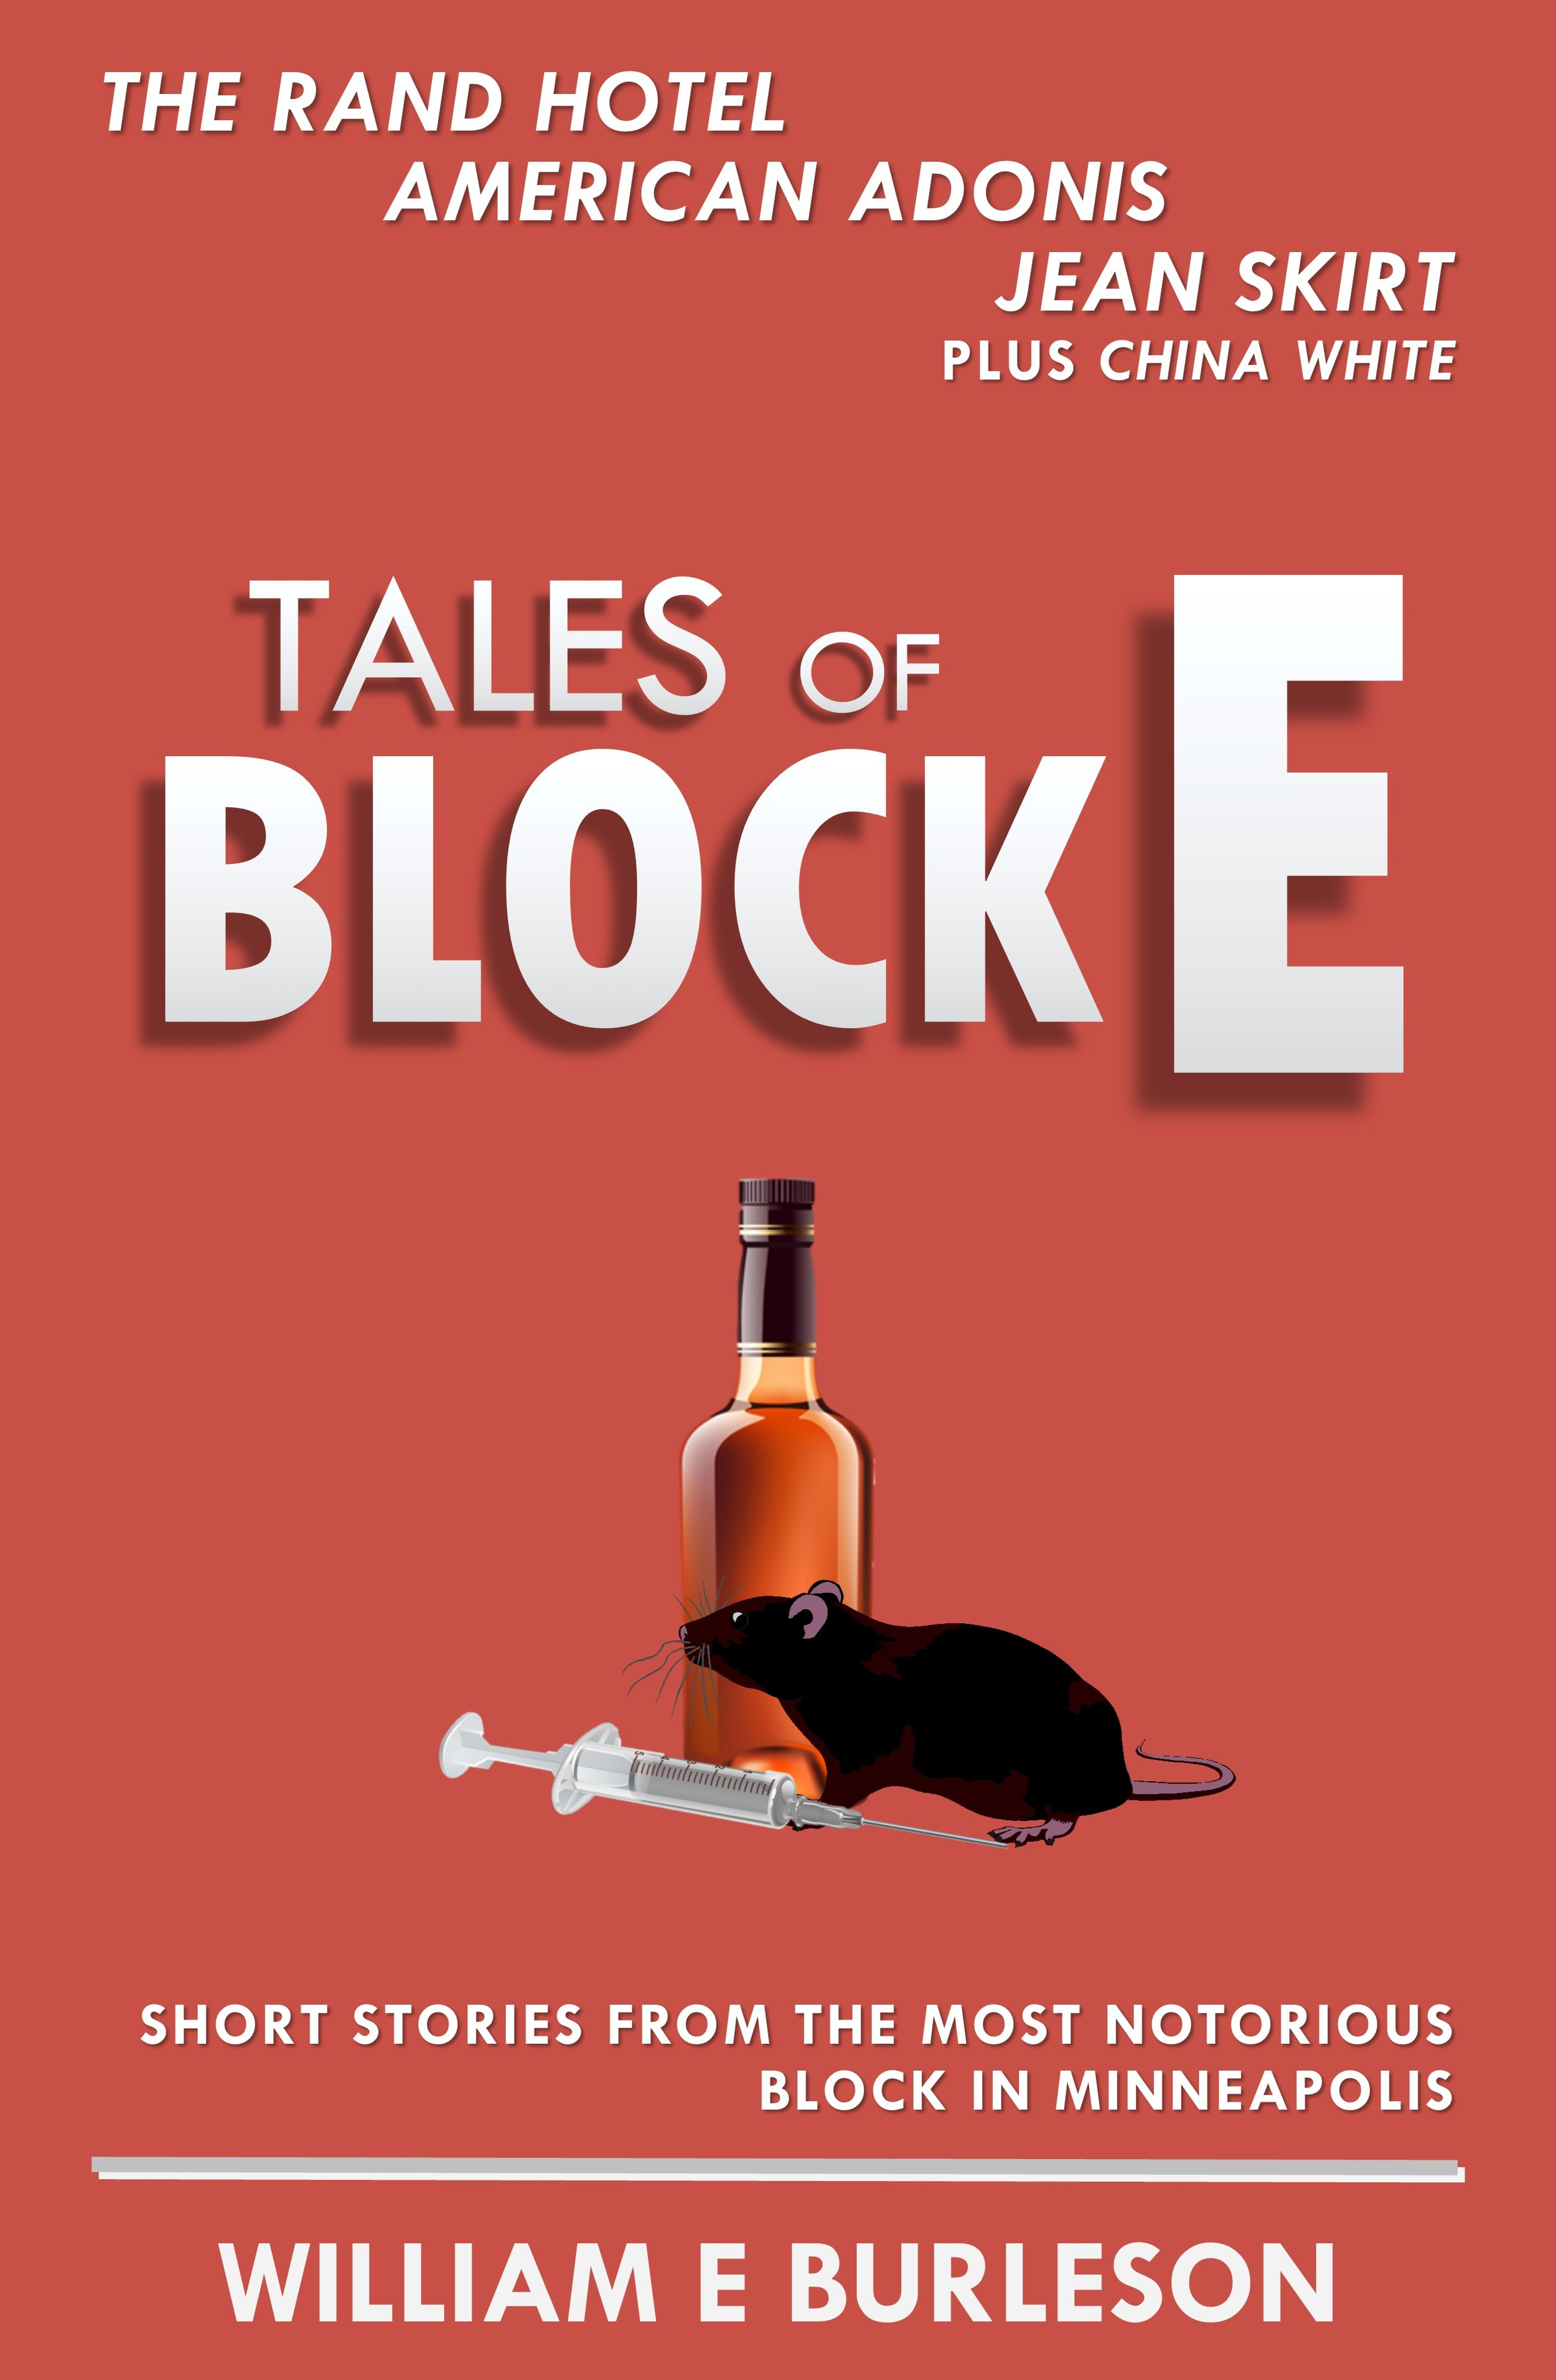 TALES OF BLOCK E book